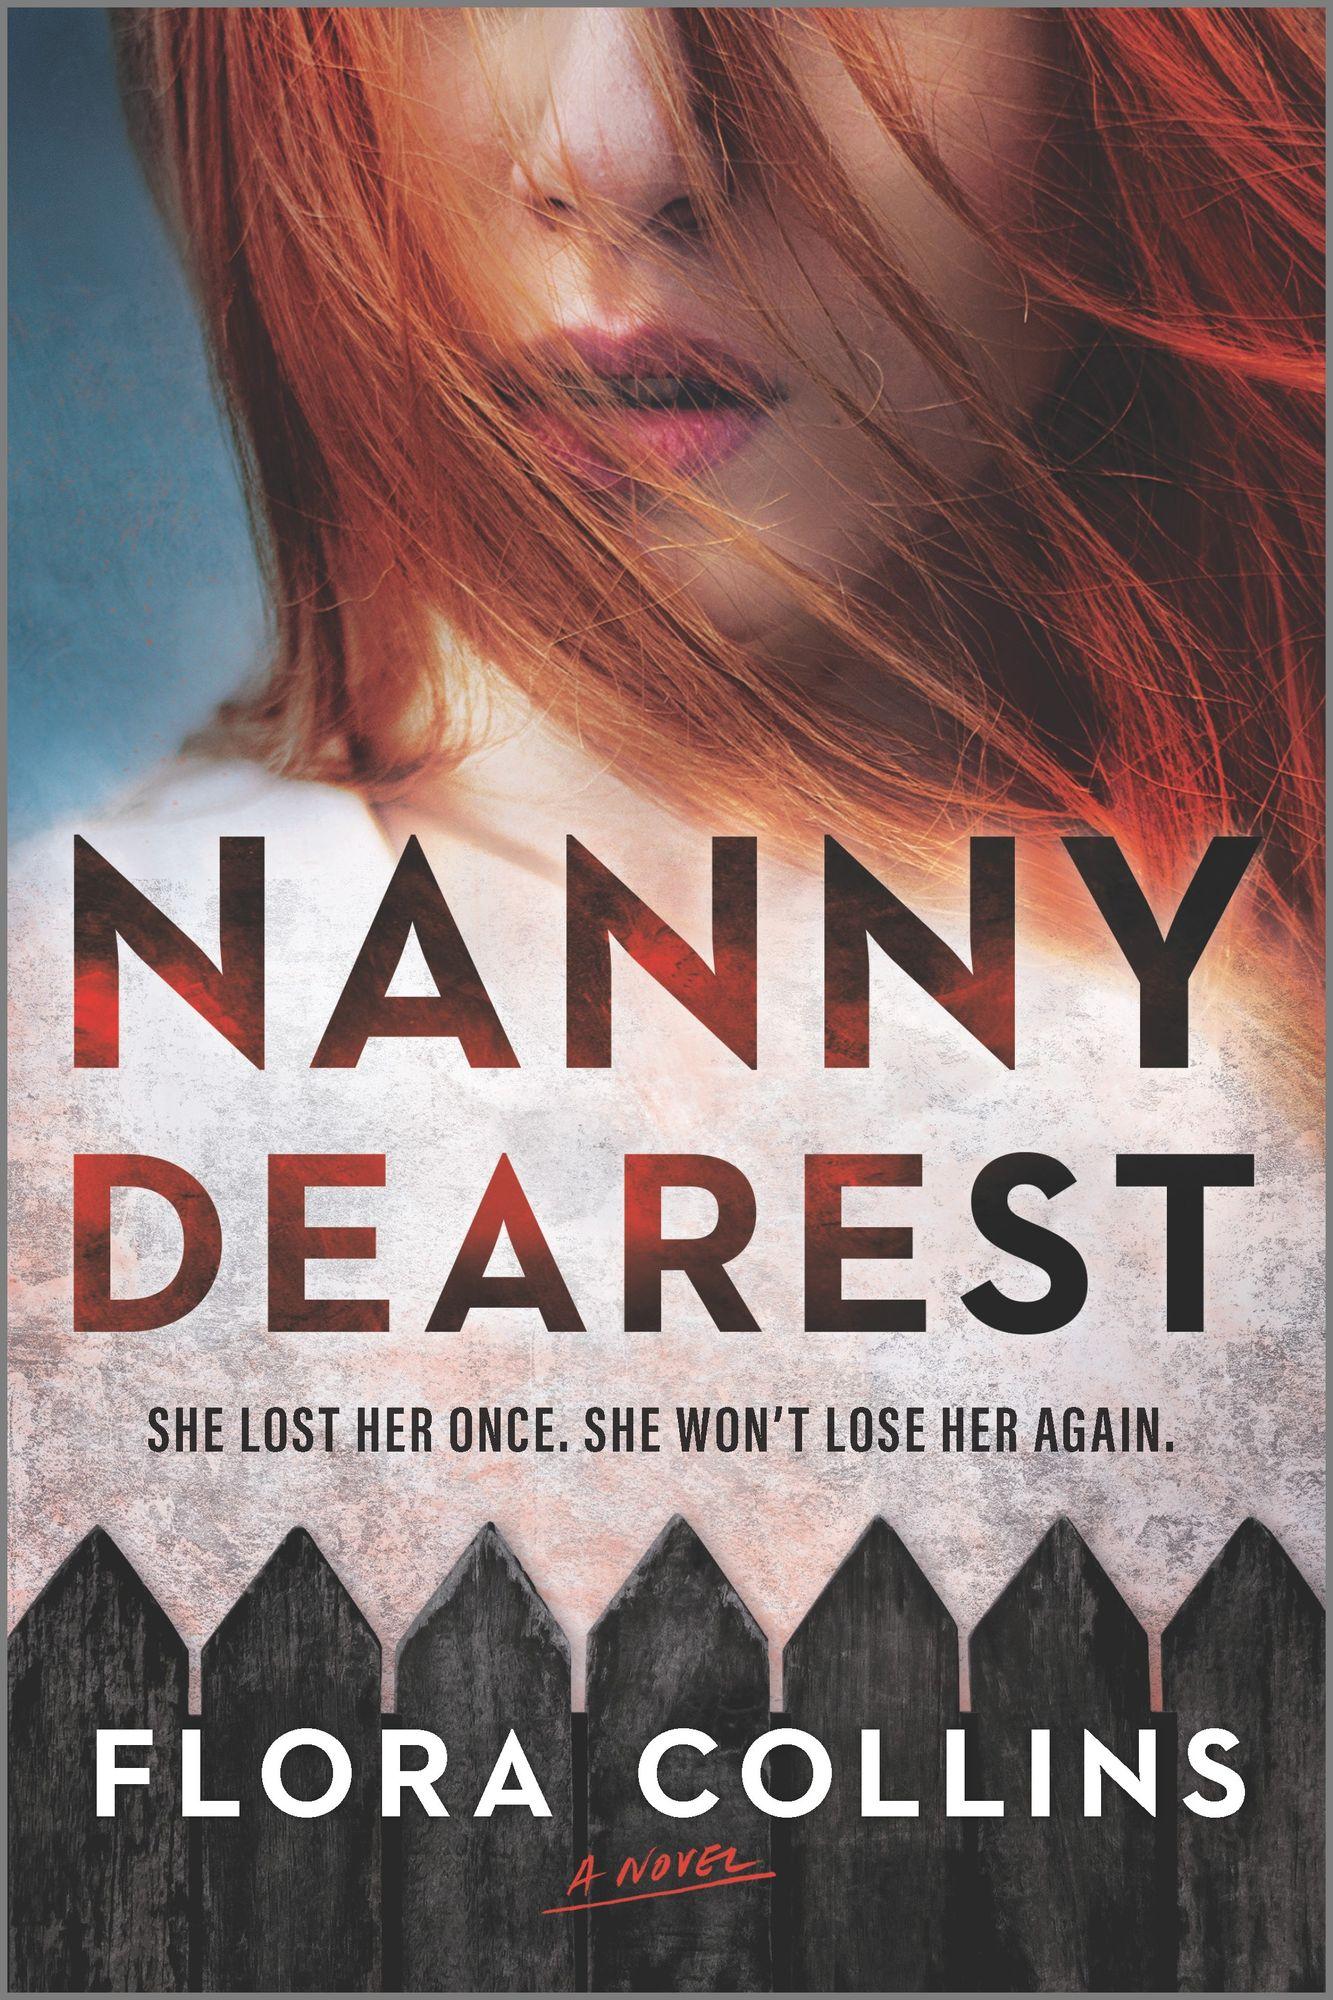 Nanny Dearest by Flora Collins